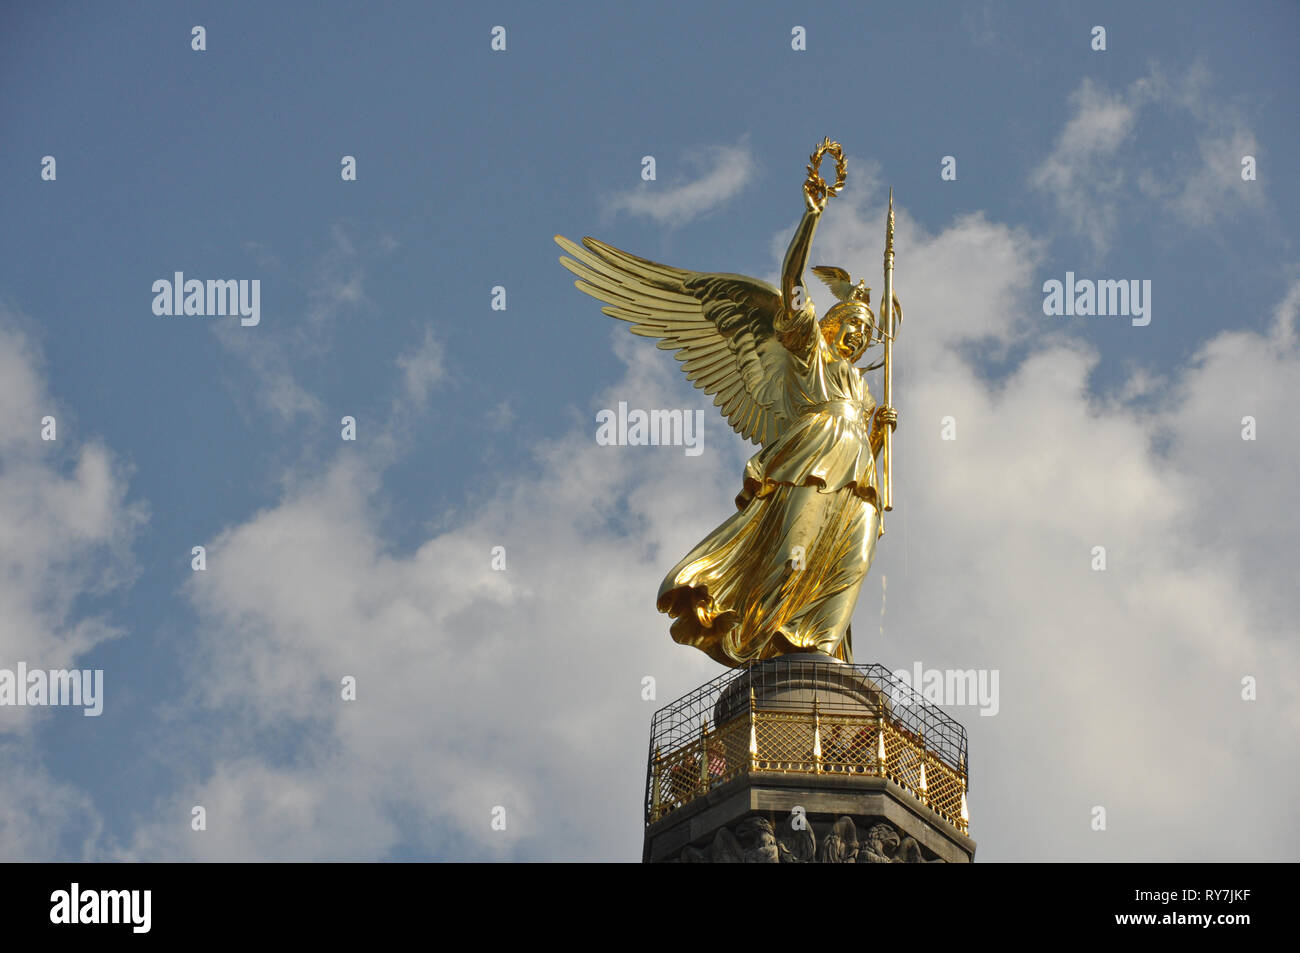 Berlin Victory Statue - Stock Image